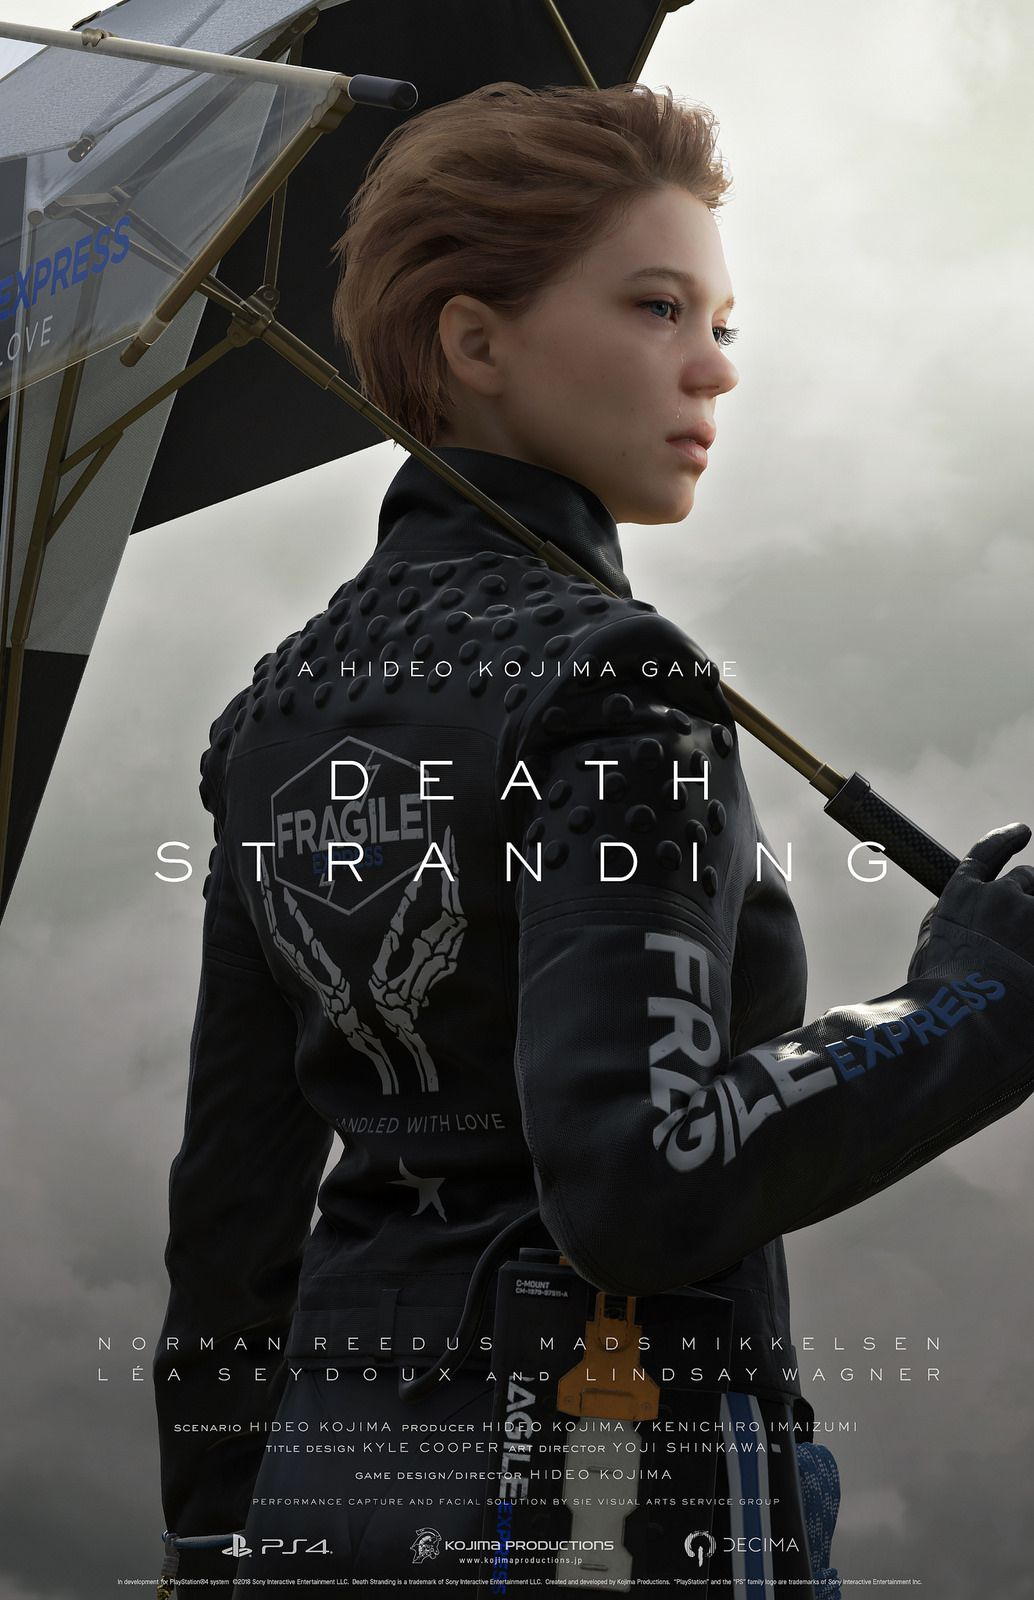 Lea Seydoux character poster - Death Stranding